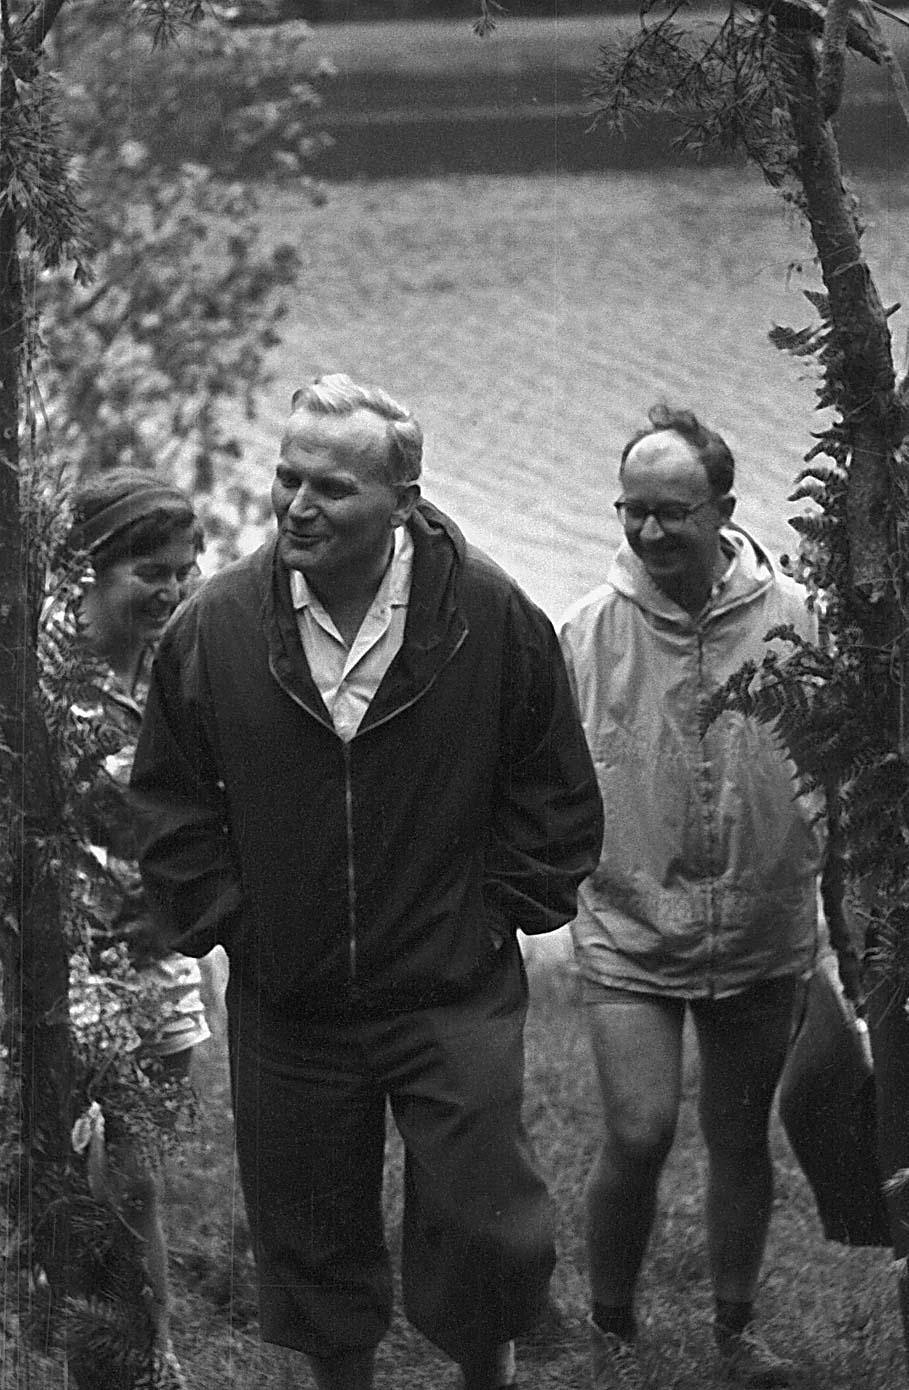 20 Images that Prove St John Paul II was the Coolest Saint Ever